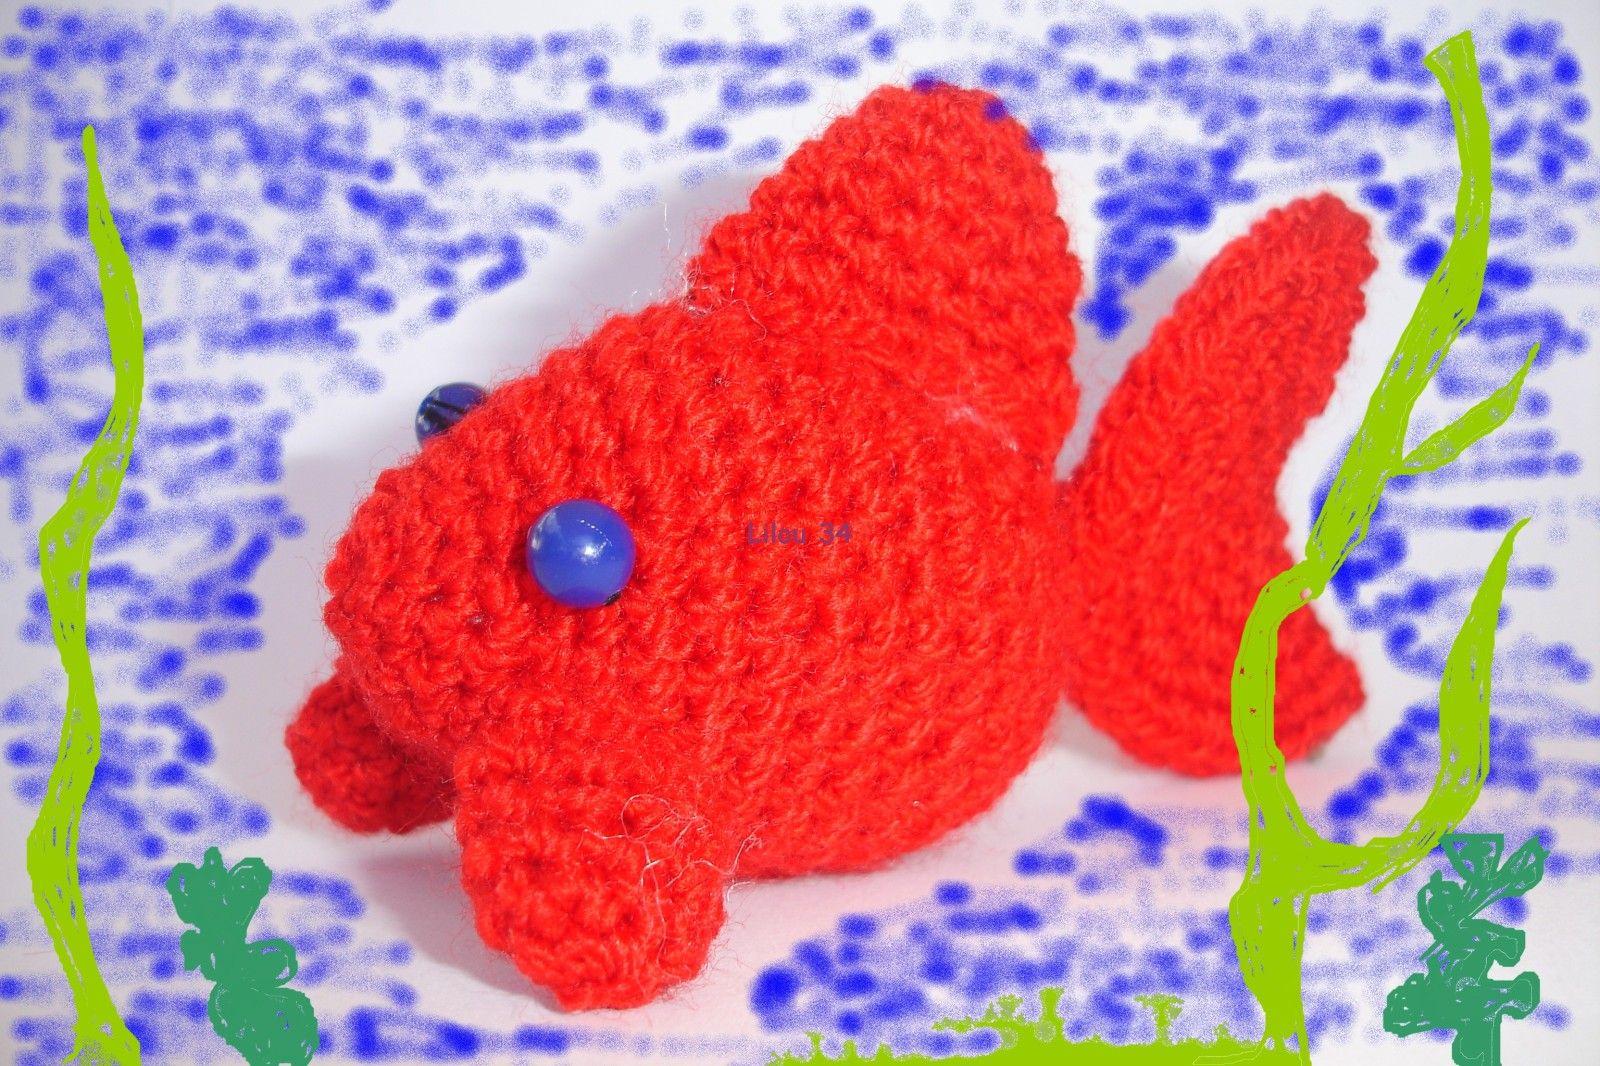 poisson crochet diy modele tuto gratuit diy tuto gratuit amigurumi crochet pinterest petit. Black Bedroom Furniture Sets. Home Design Ideas